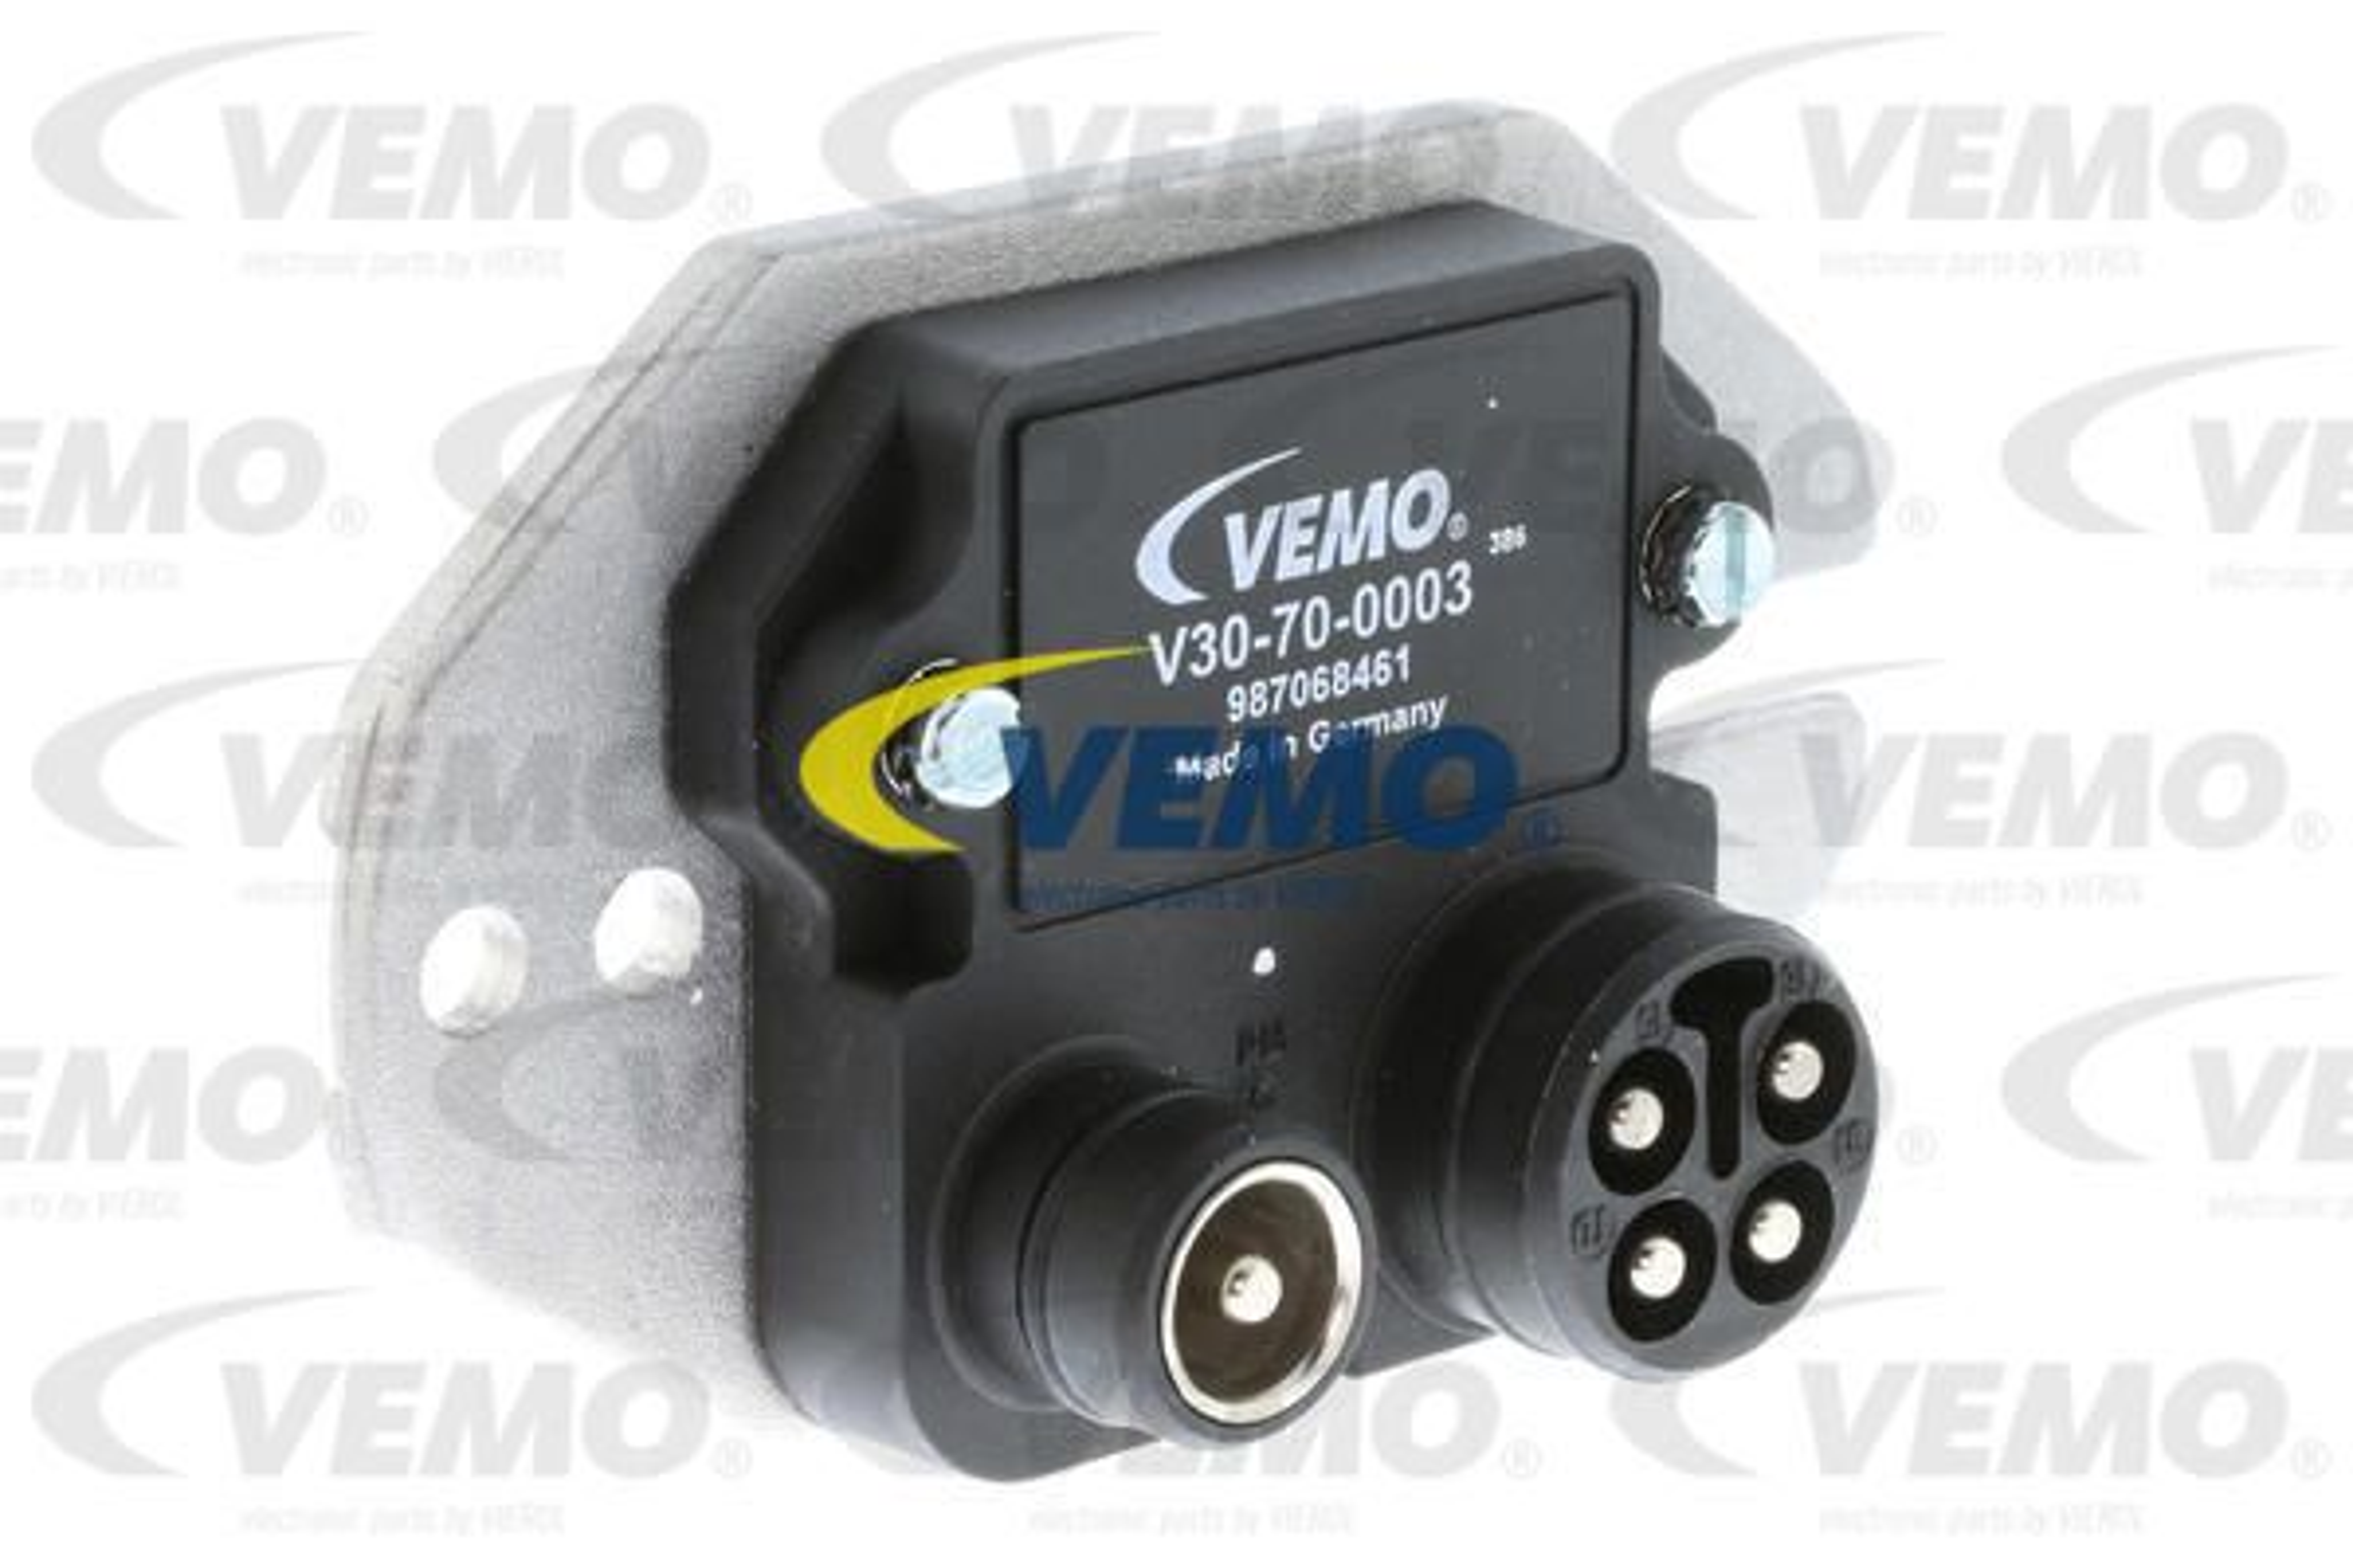 VEMO: Original Zündsteuergerät V30-70-0003 ()